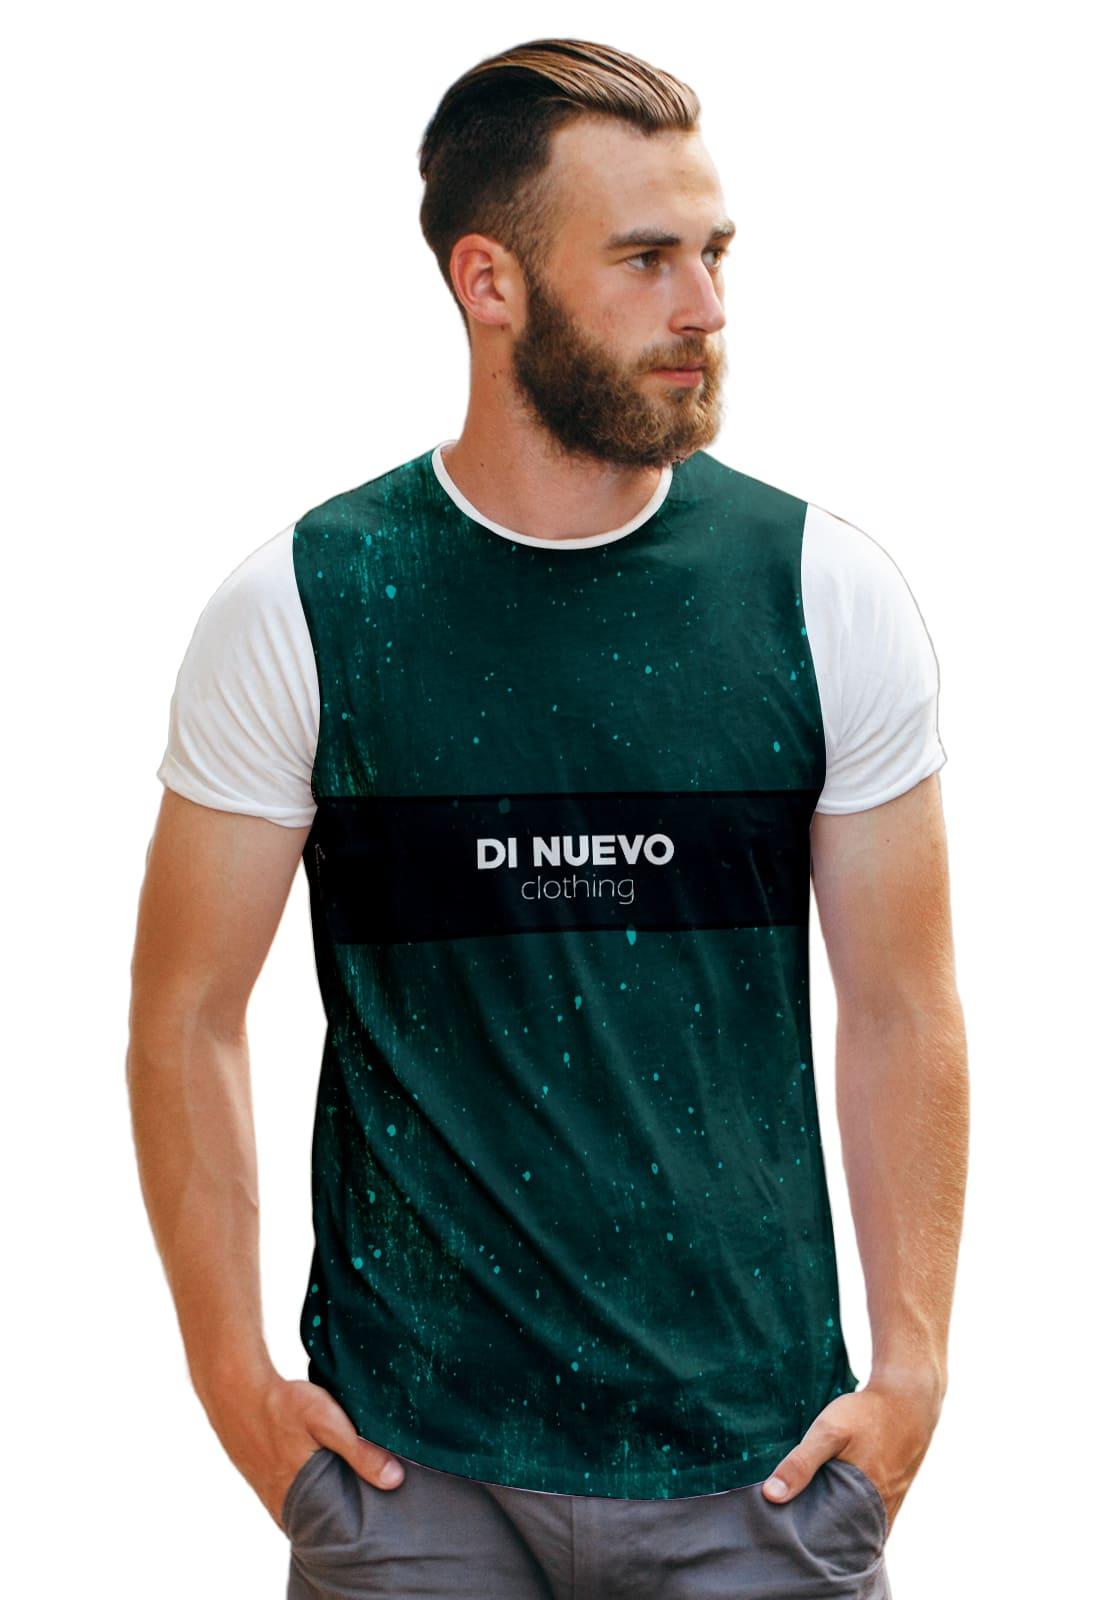 Camiseta Trap Style Di Nuevo Clothing Green